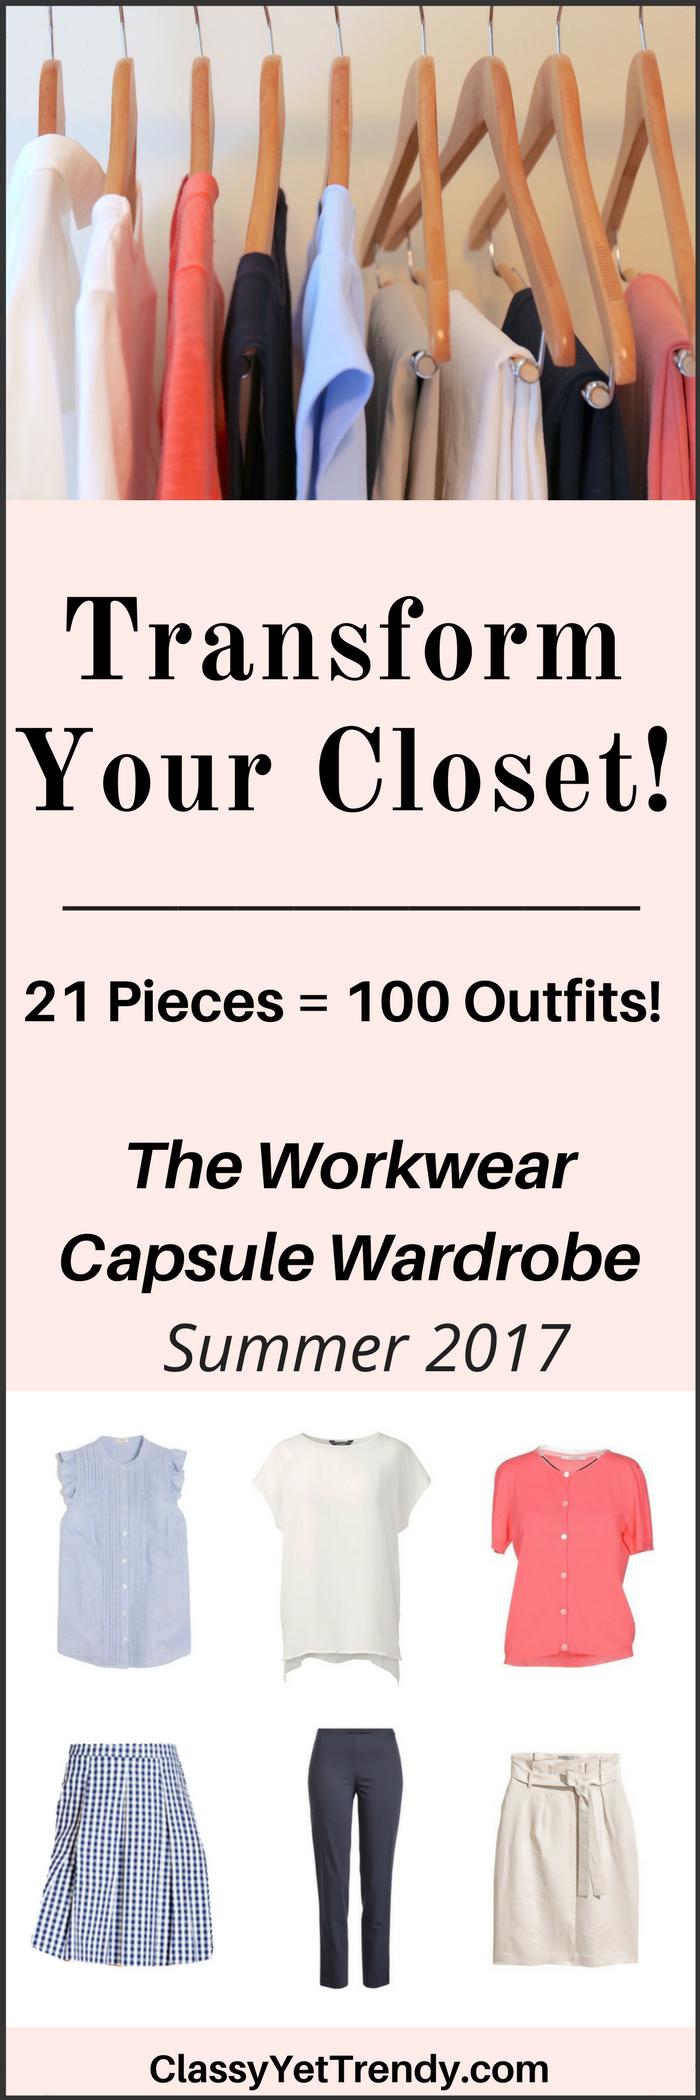 The Workwear Summer 2017 Capsule Wardrobe e-book